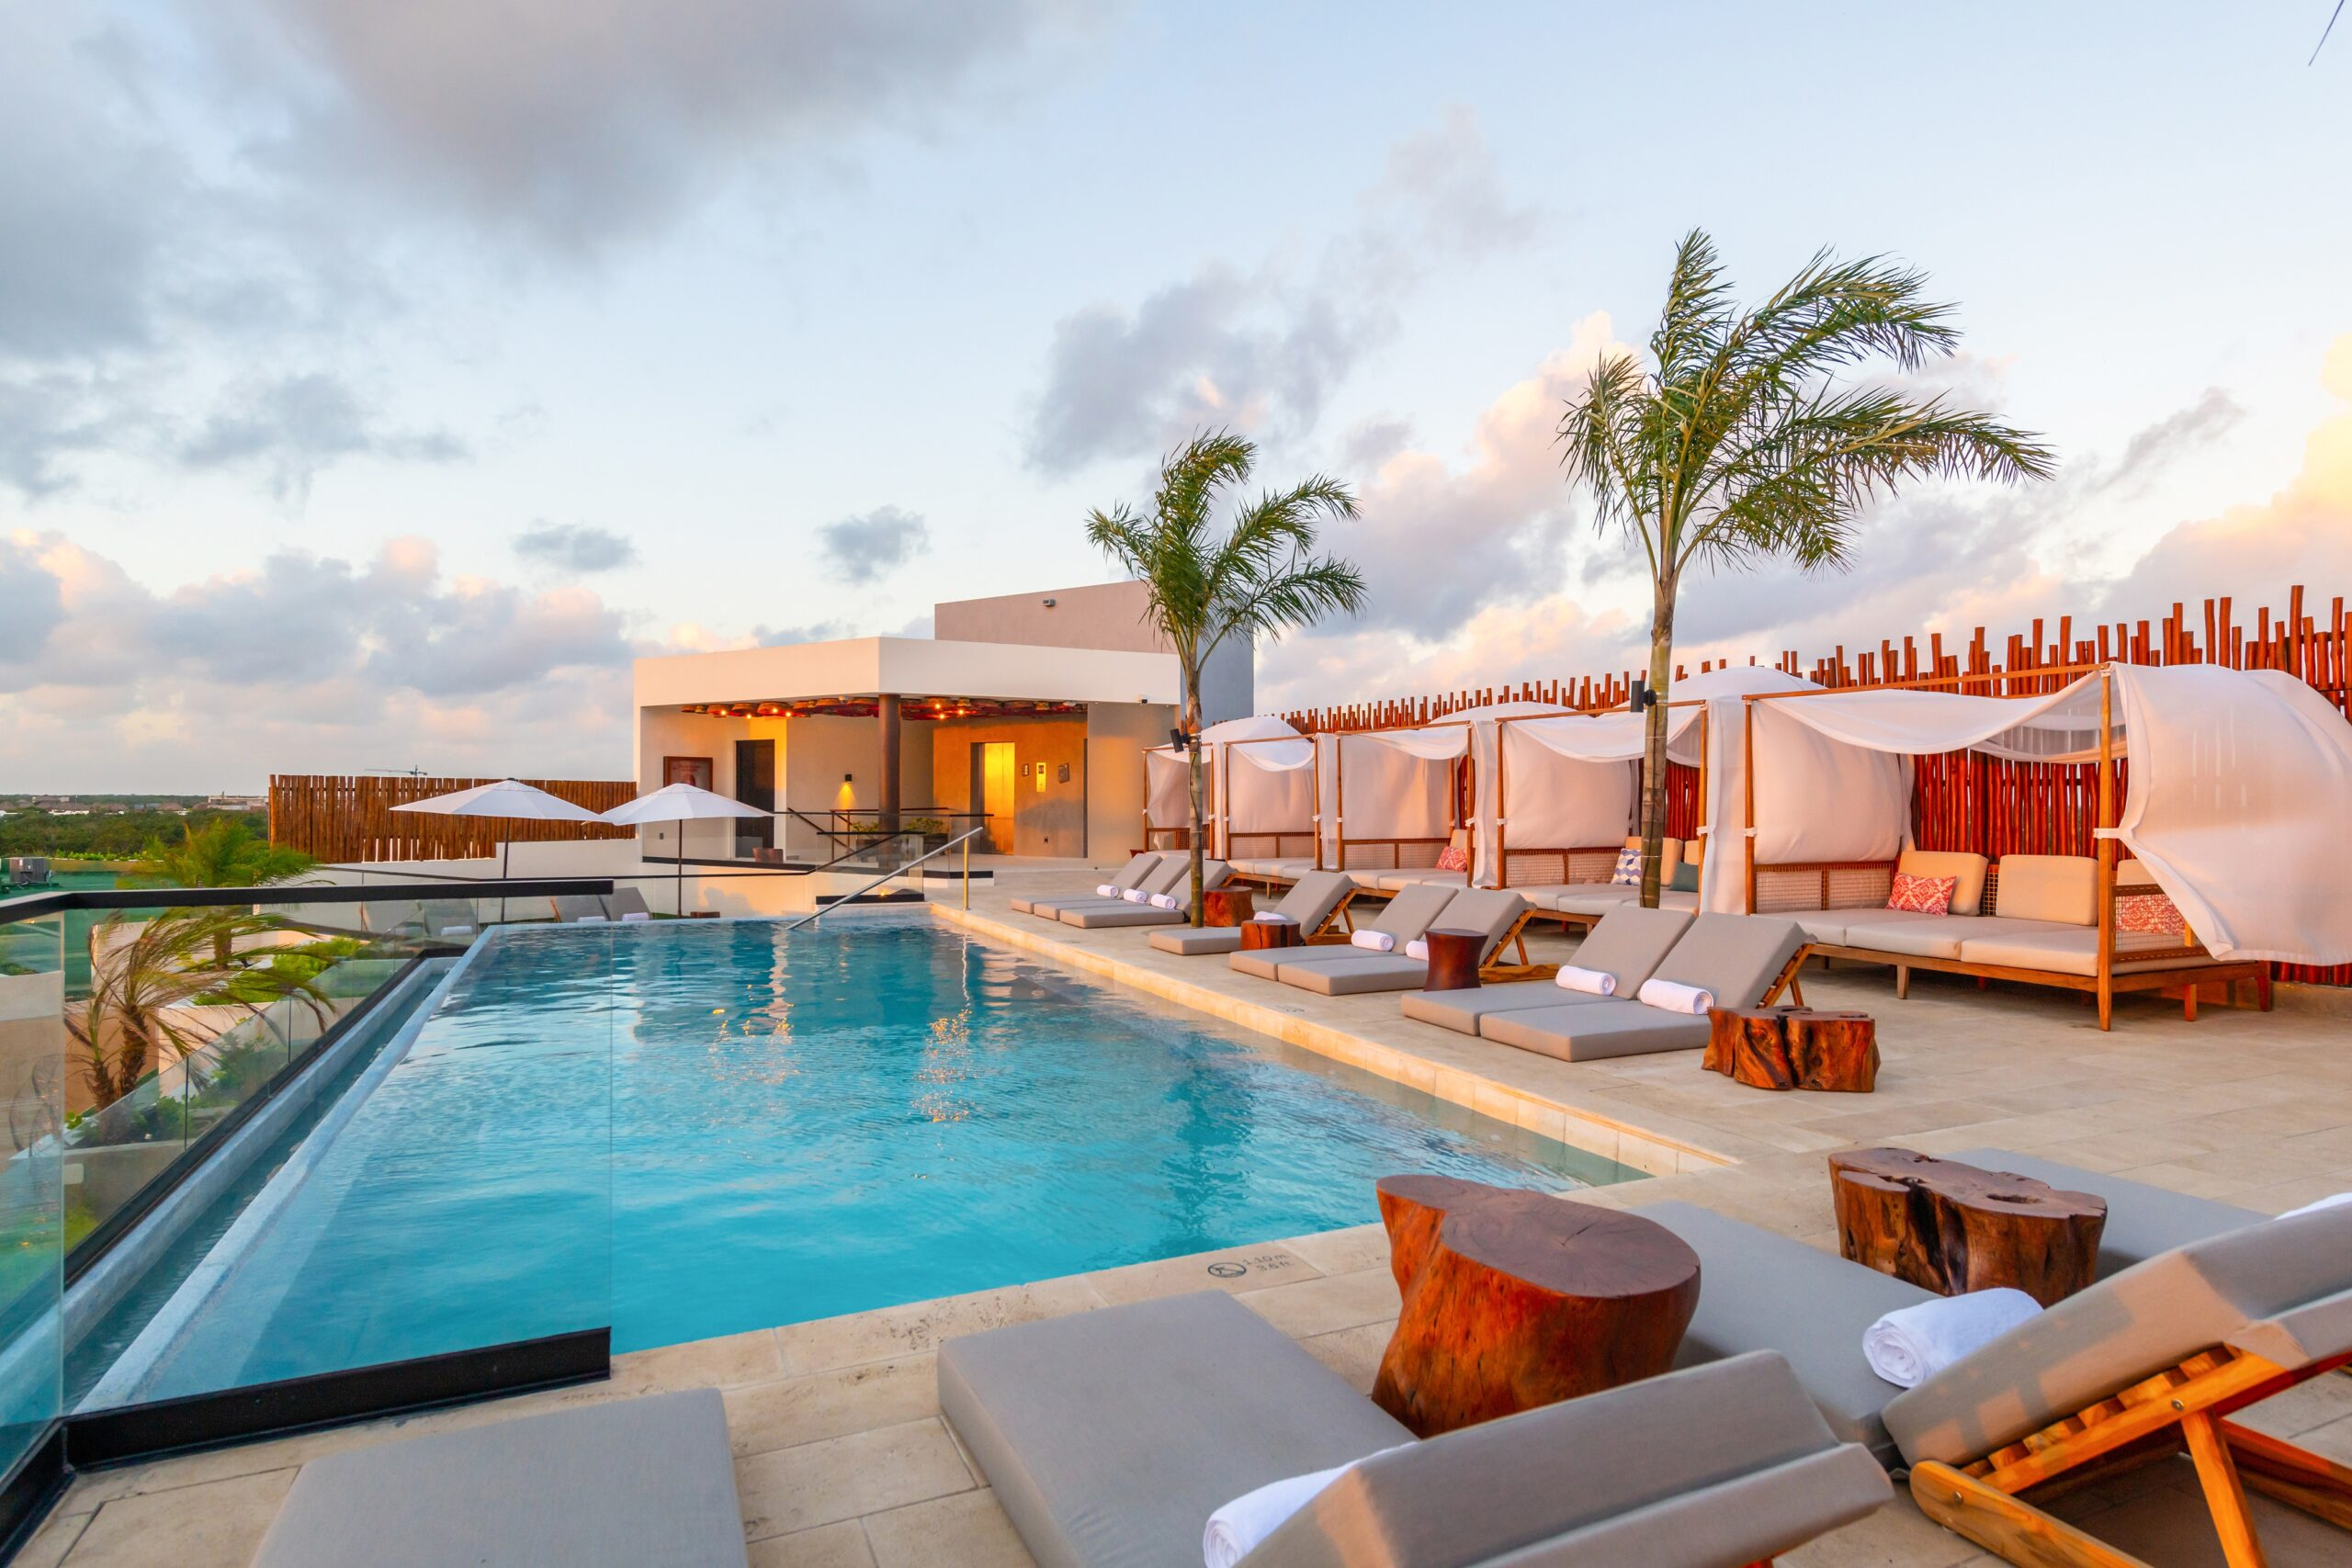 Atico Rooftop pool3.jpg